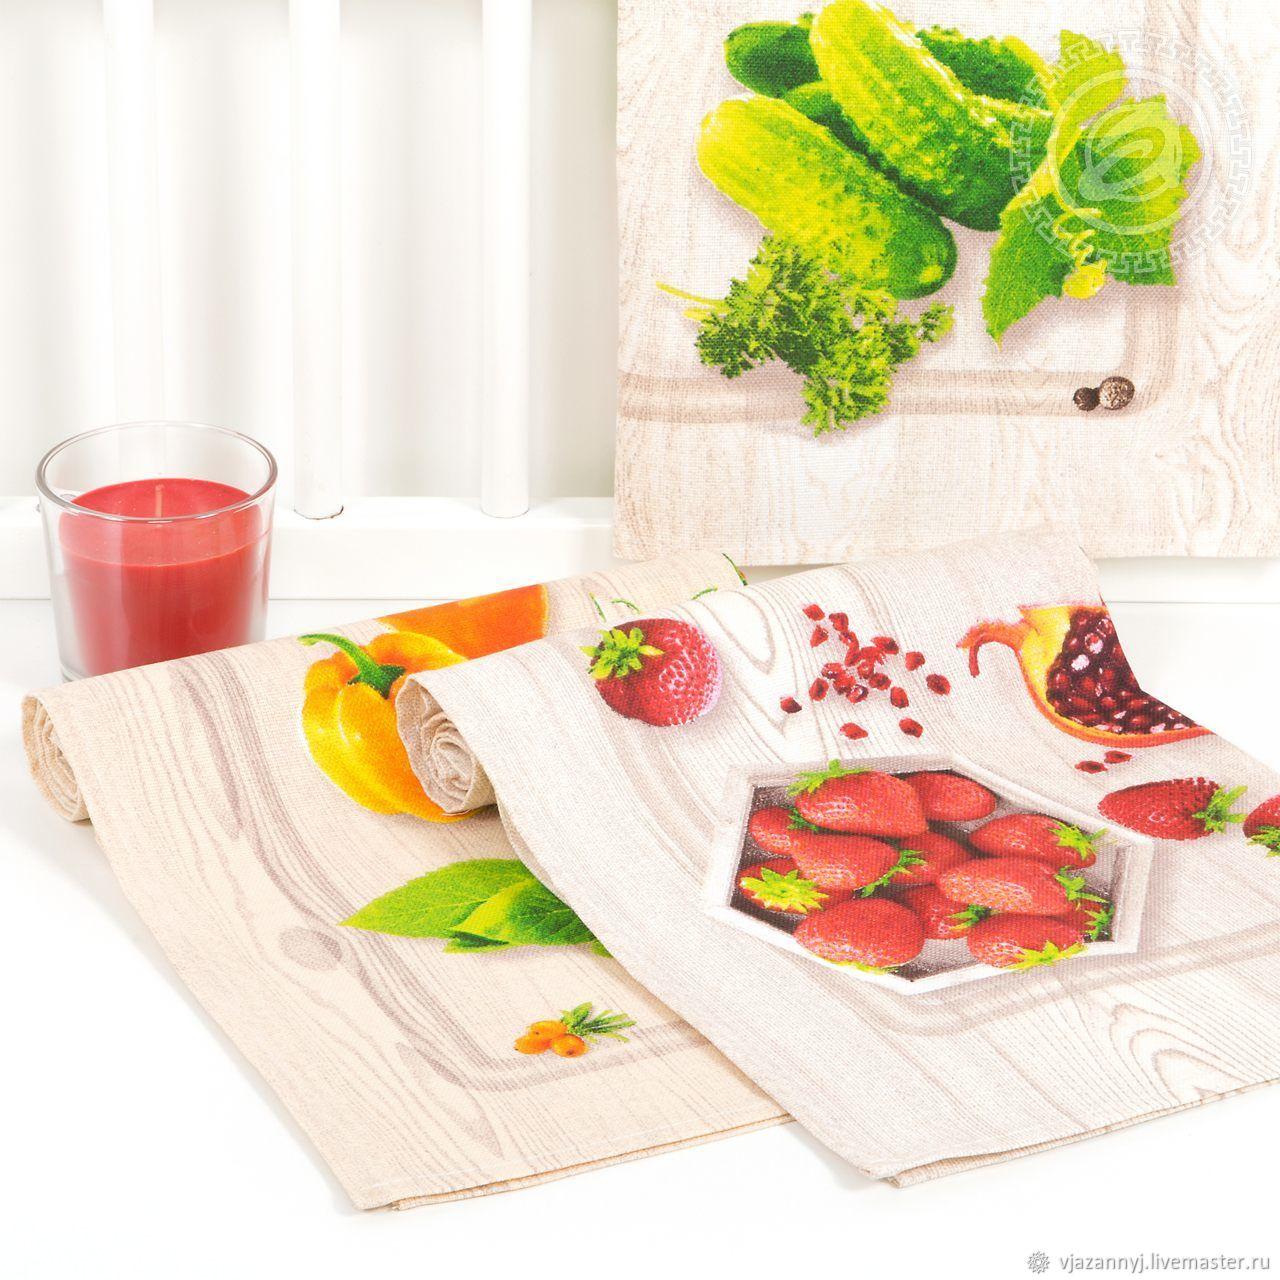 Set of towels made of matting SEASON ART 3 pcs multicolored, Towels, Moscow,  Фото №1